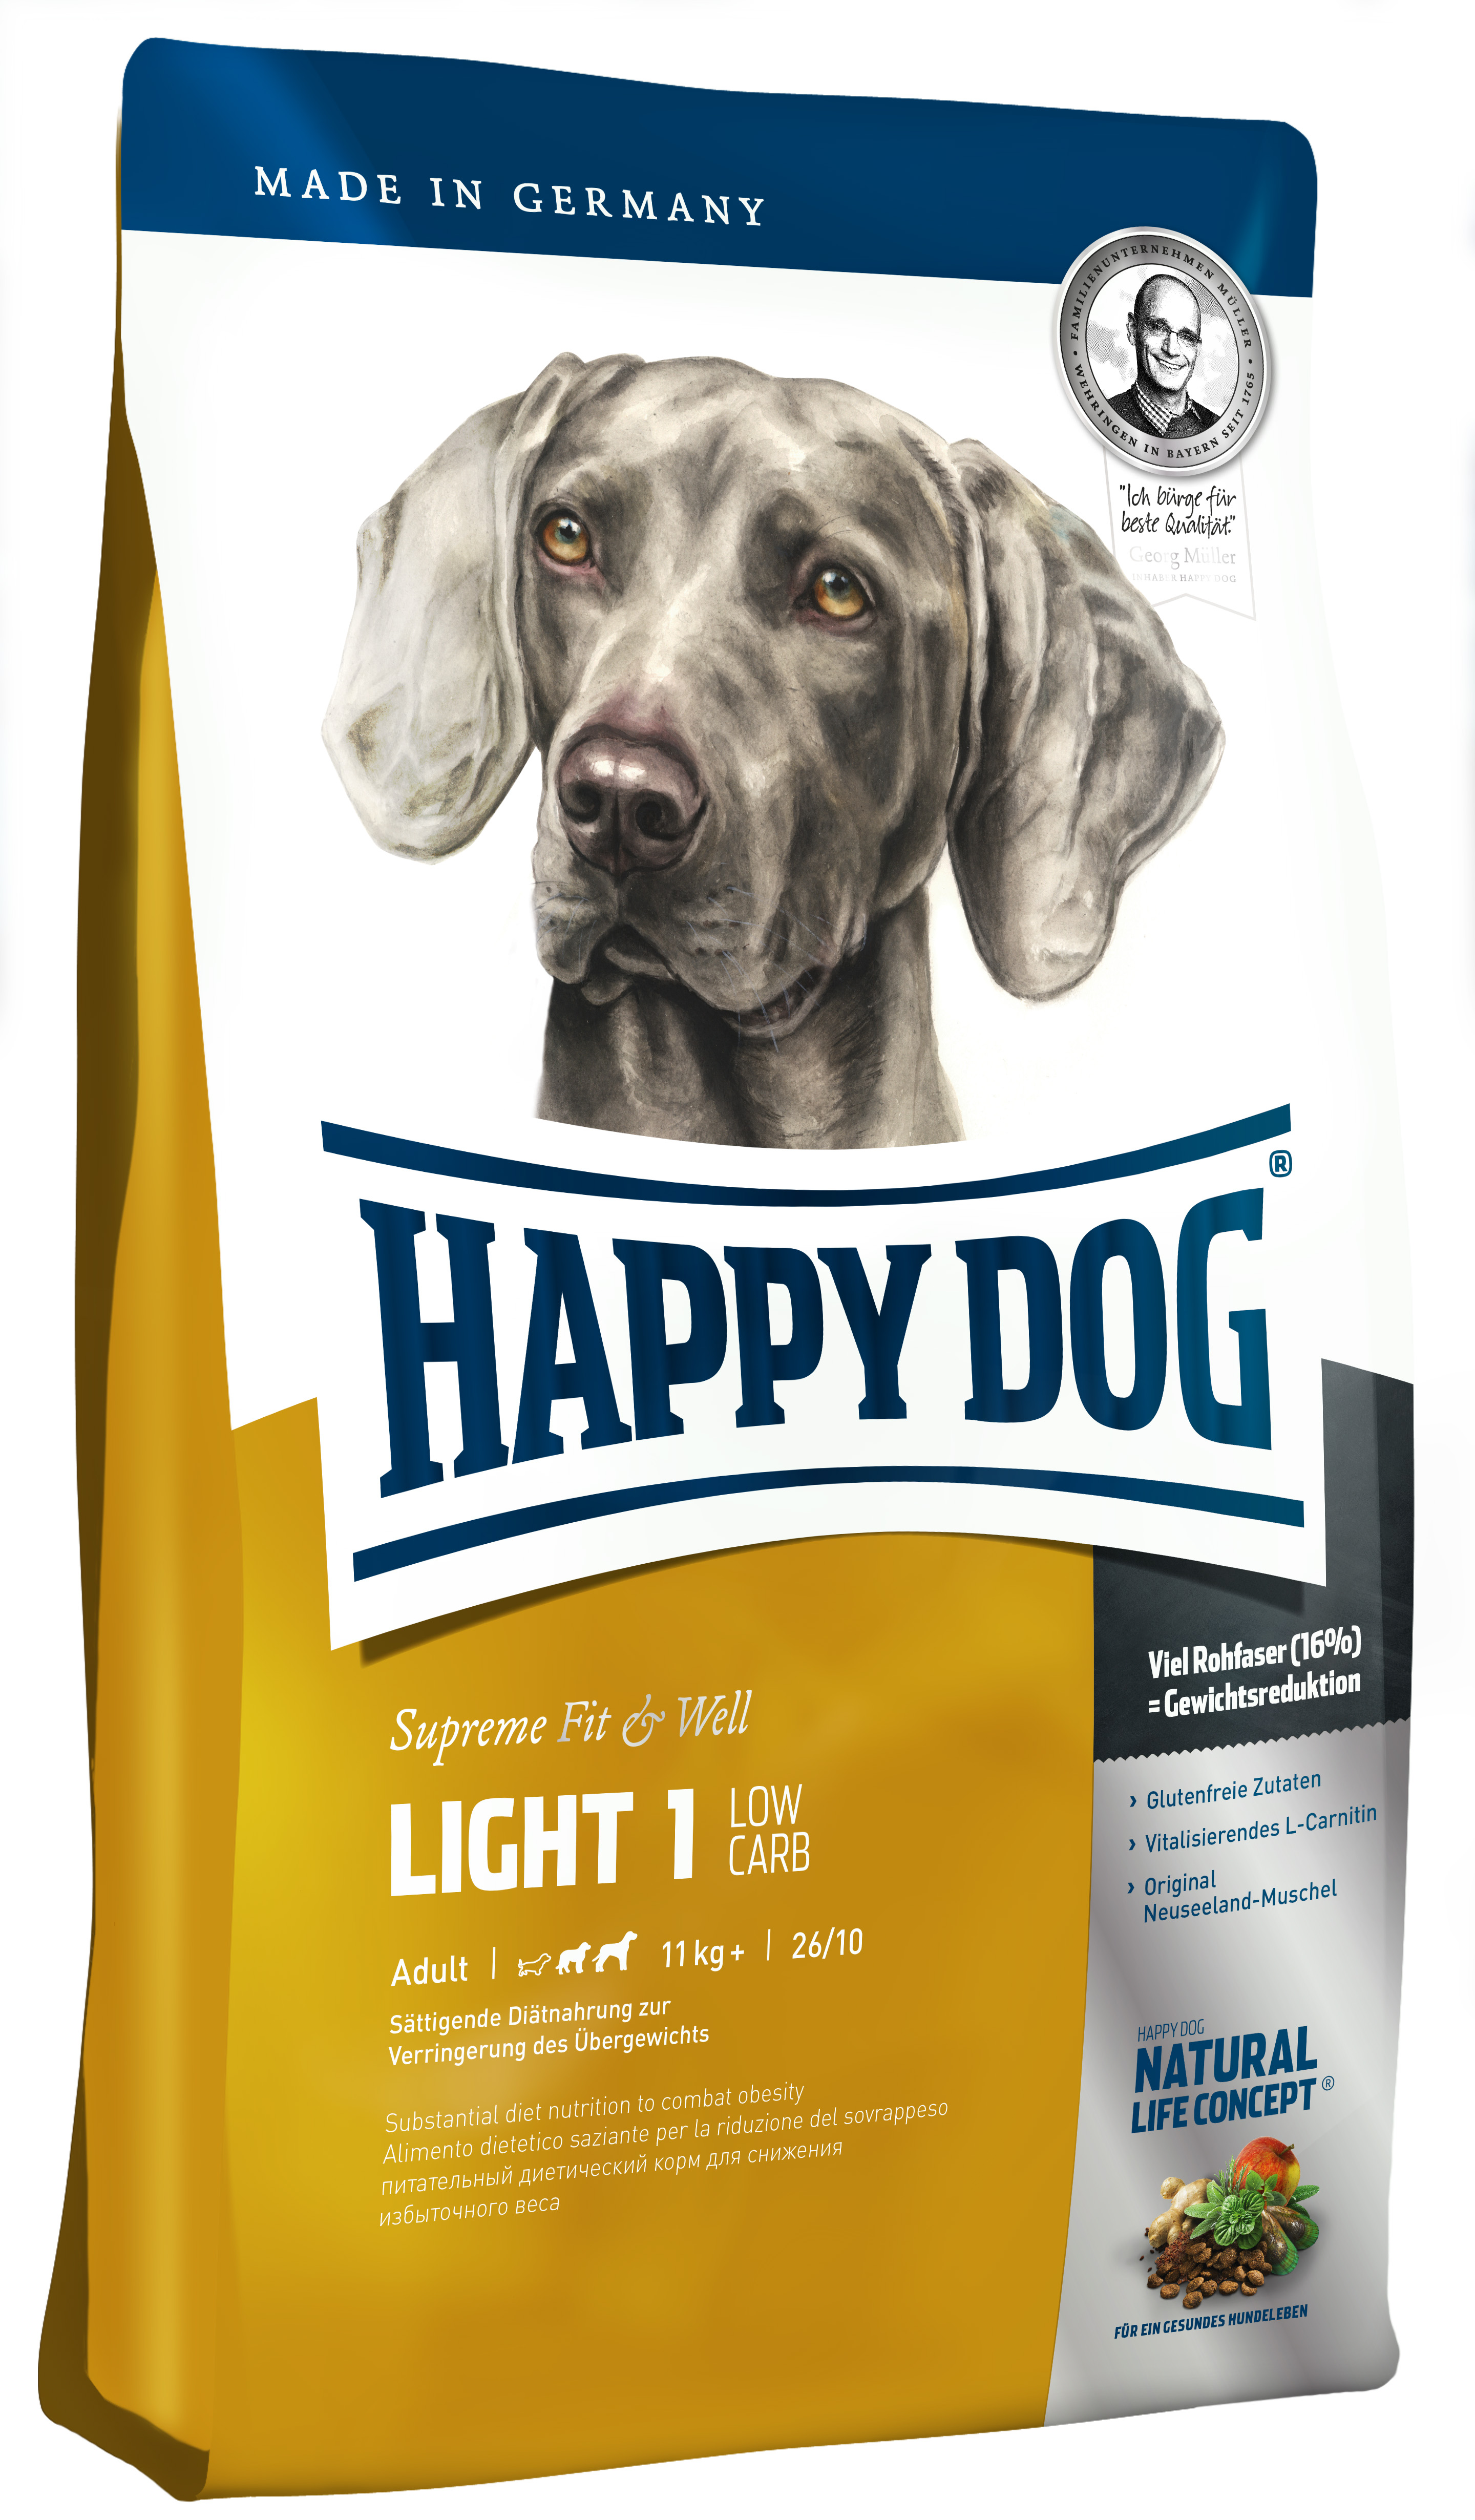 happy dog supreme fit well light1 low carb 1kg zoo co. Black Bedroom Furniture Sets. Home Design Ideas